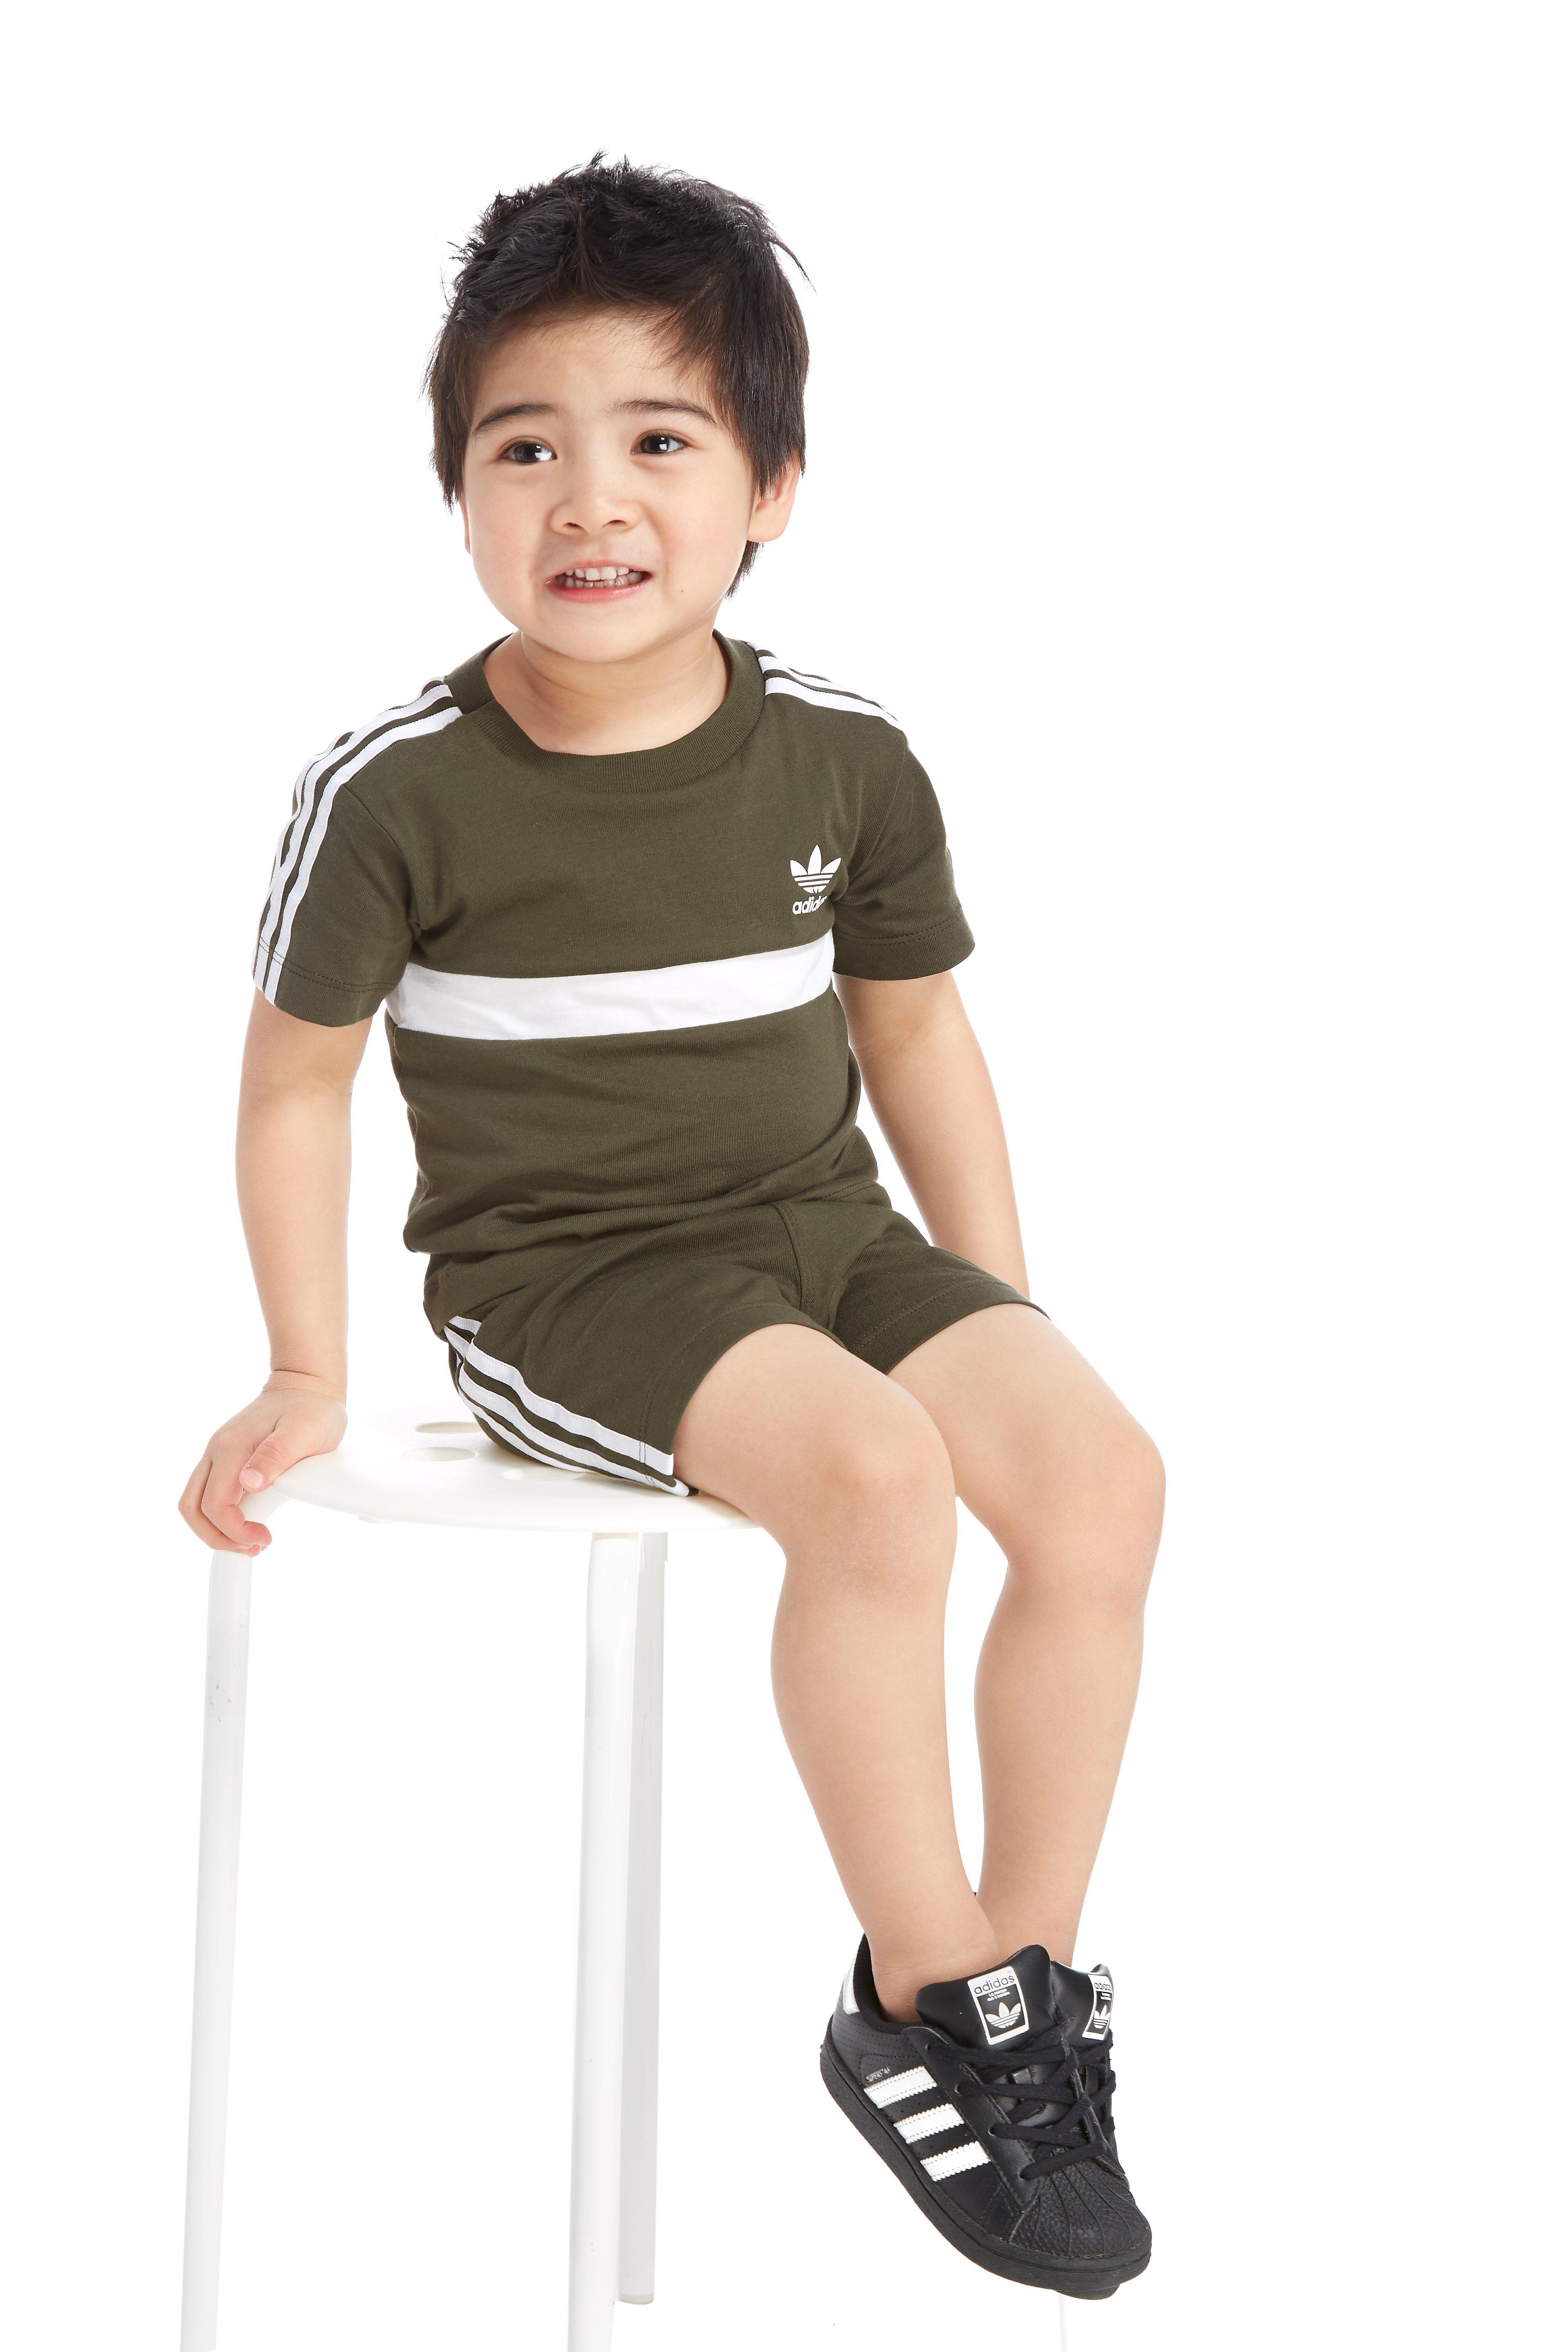 adidas Originals Itasca T-Shirt/Shorts Set Baby's